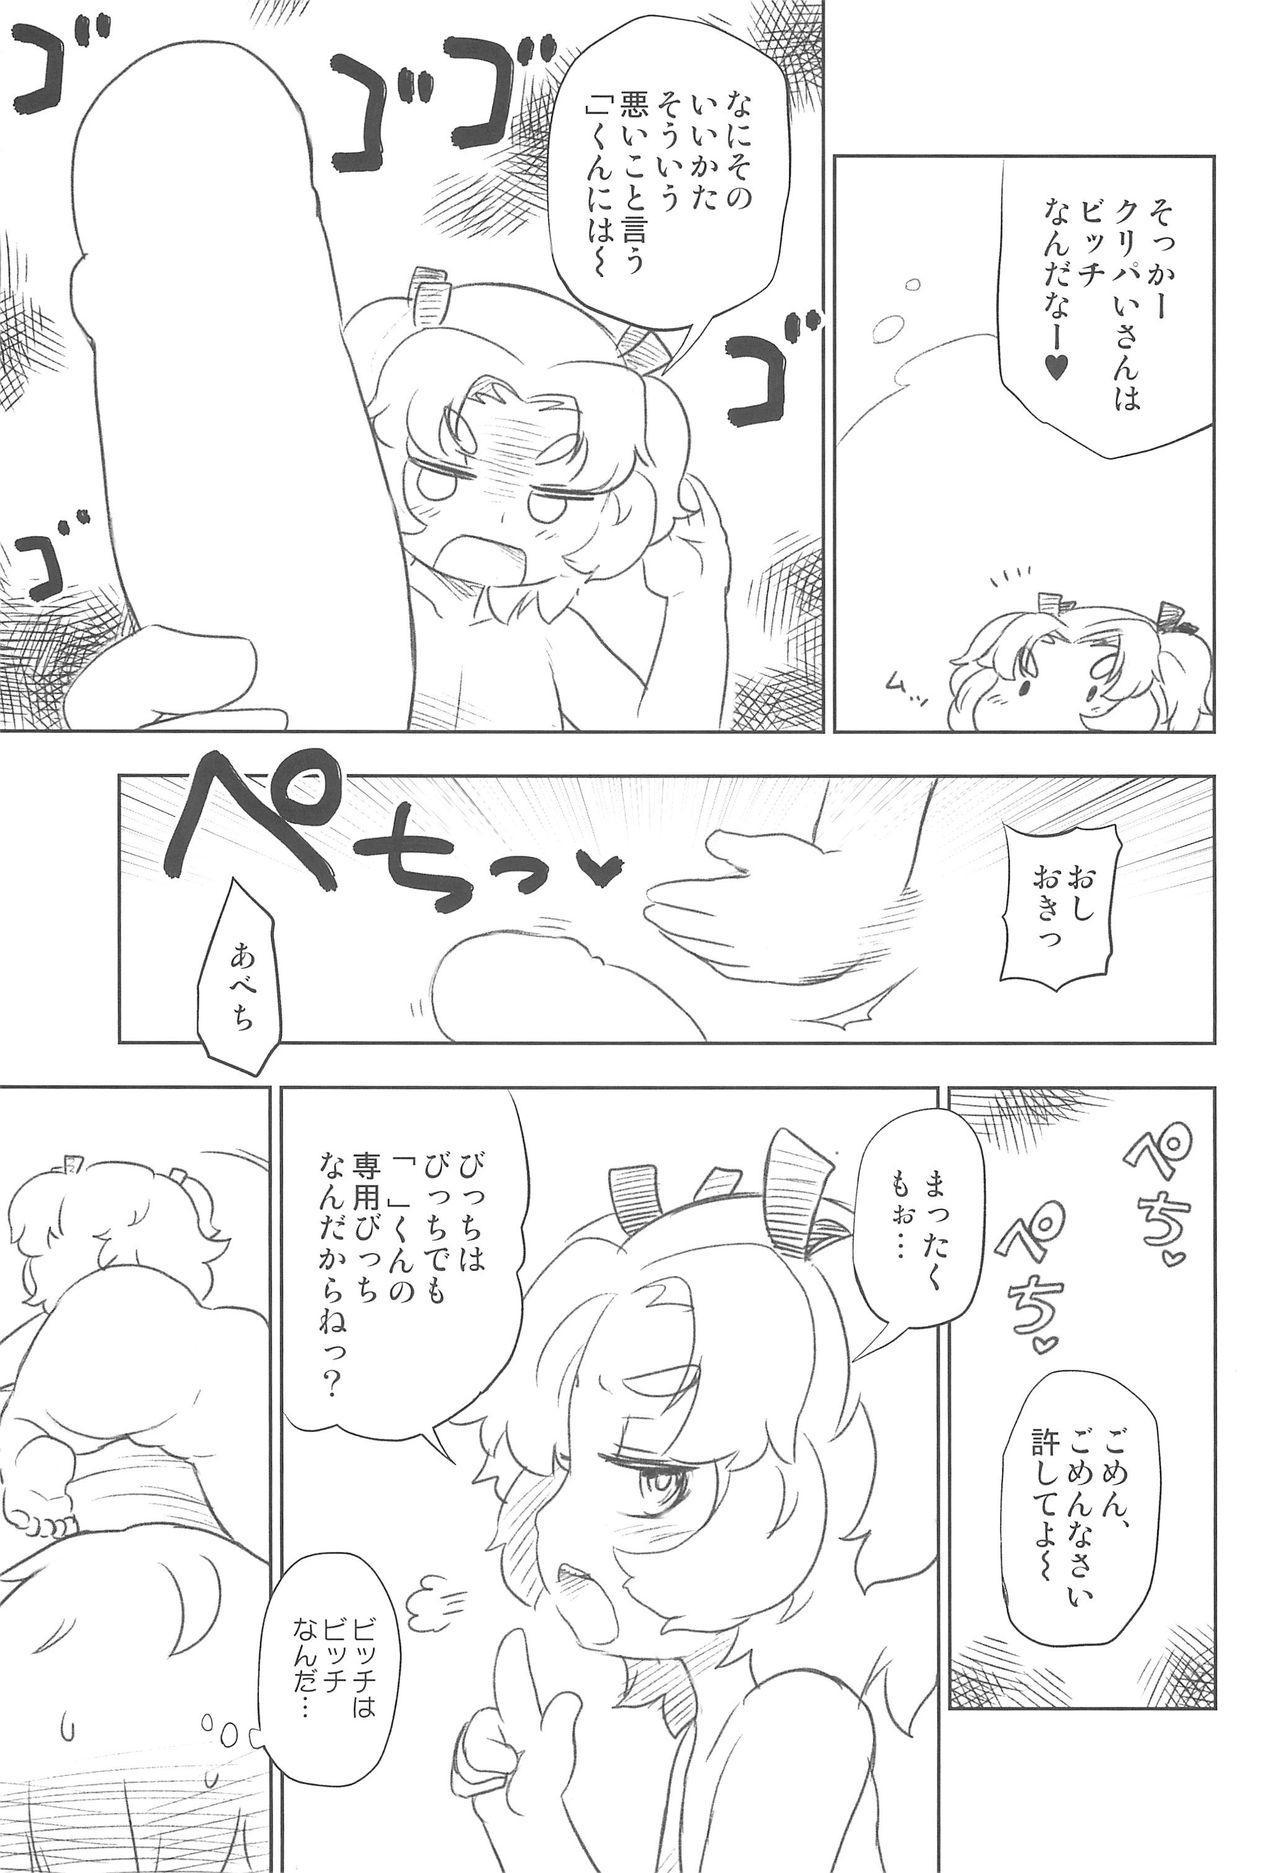 Petit Dolls VOL. 9 Creampie-san Torotoro Amaai Nakadashi Girl 12